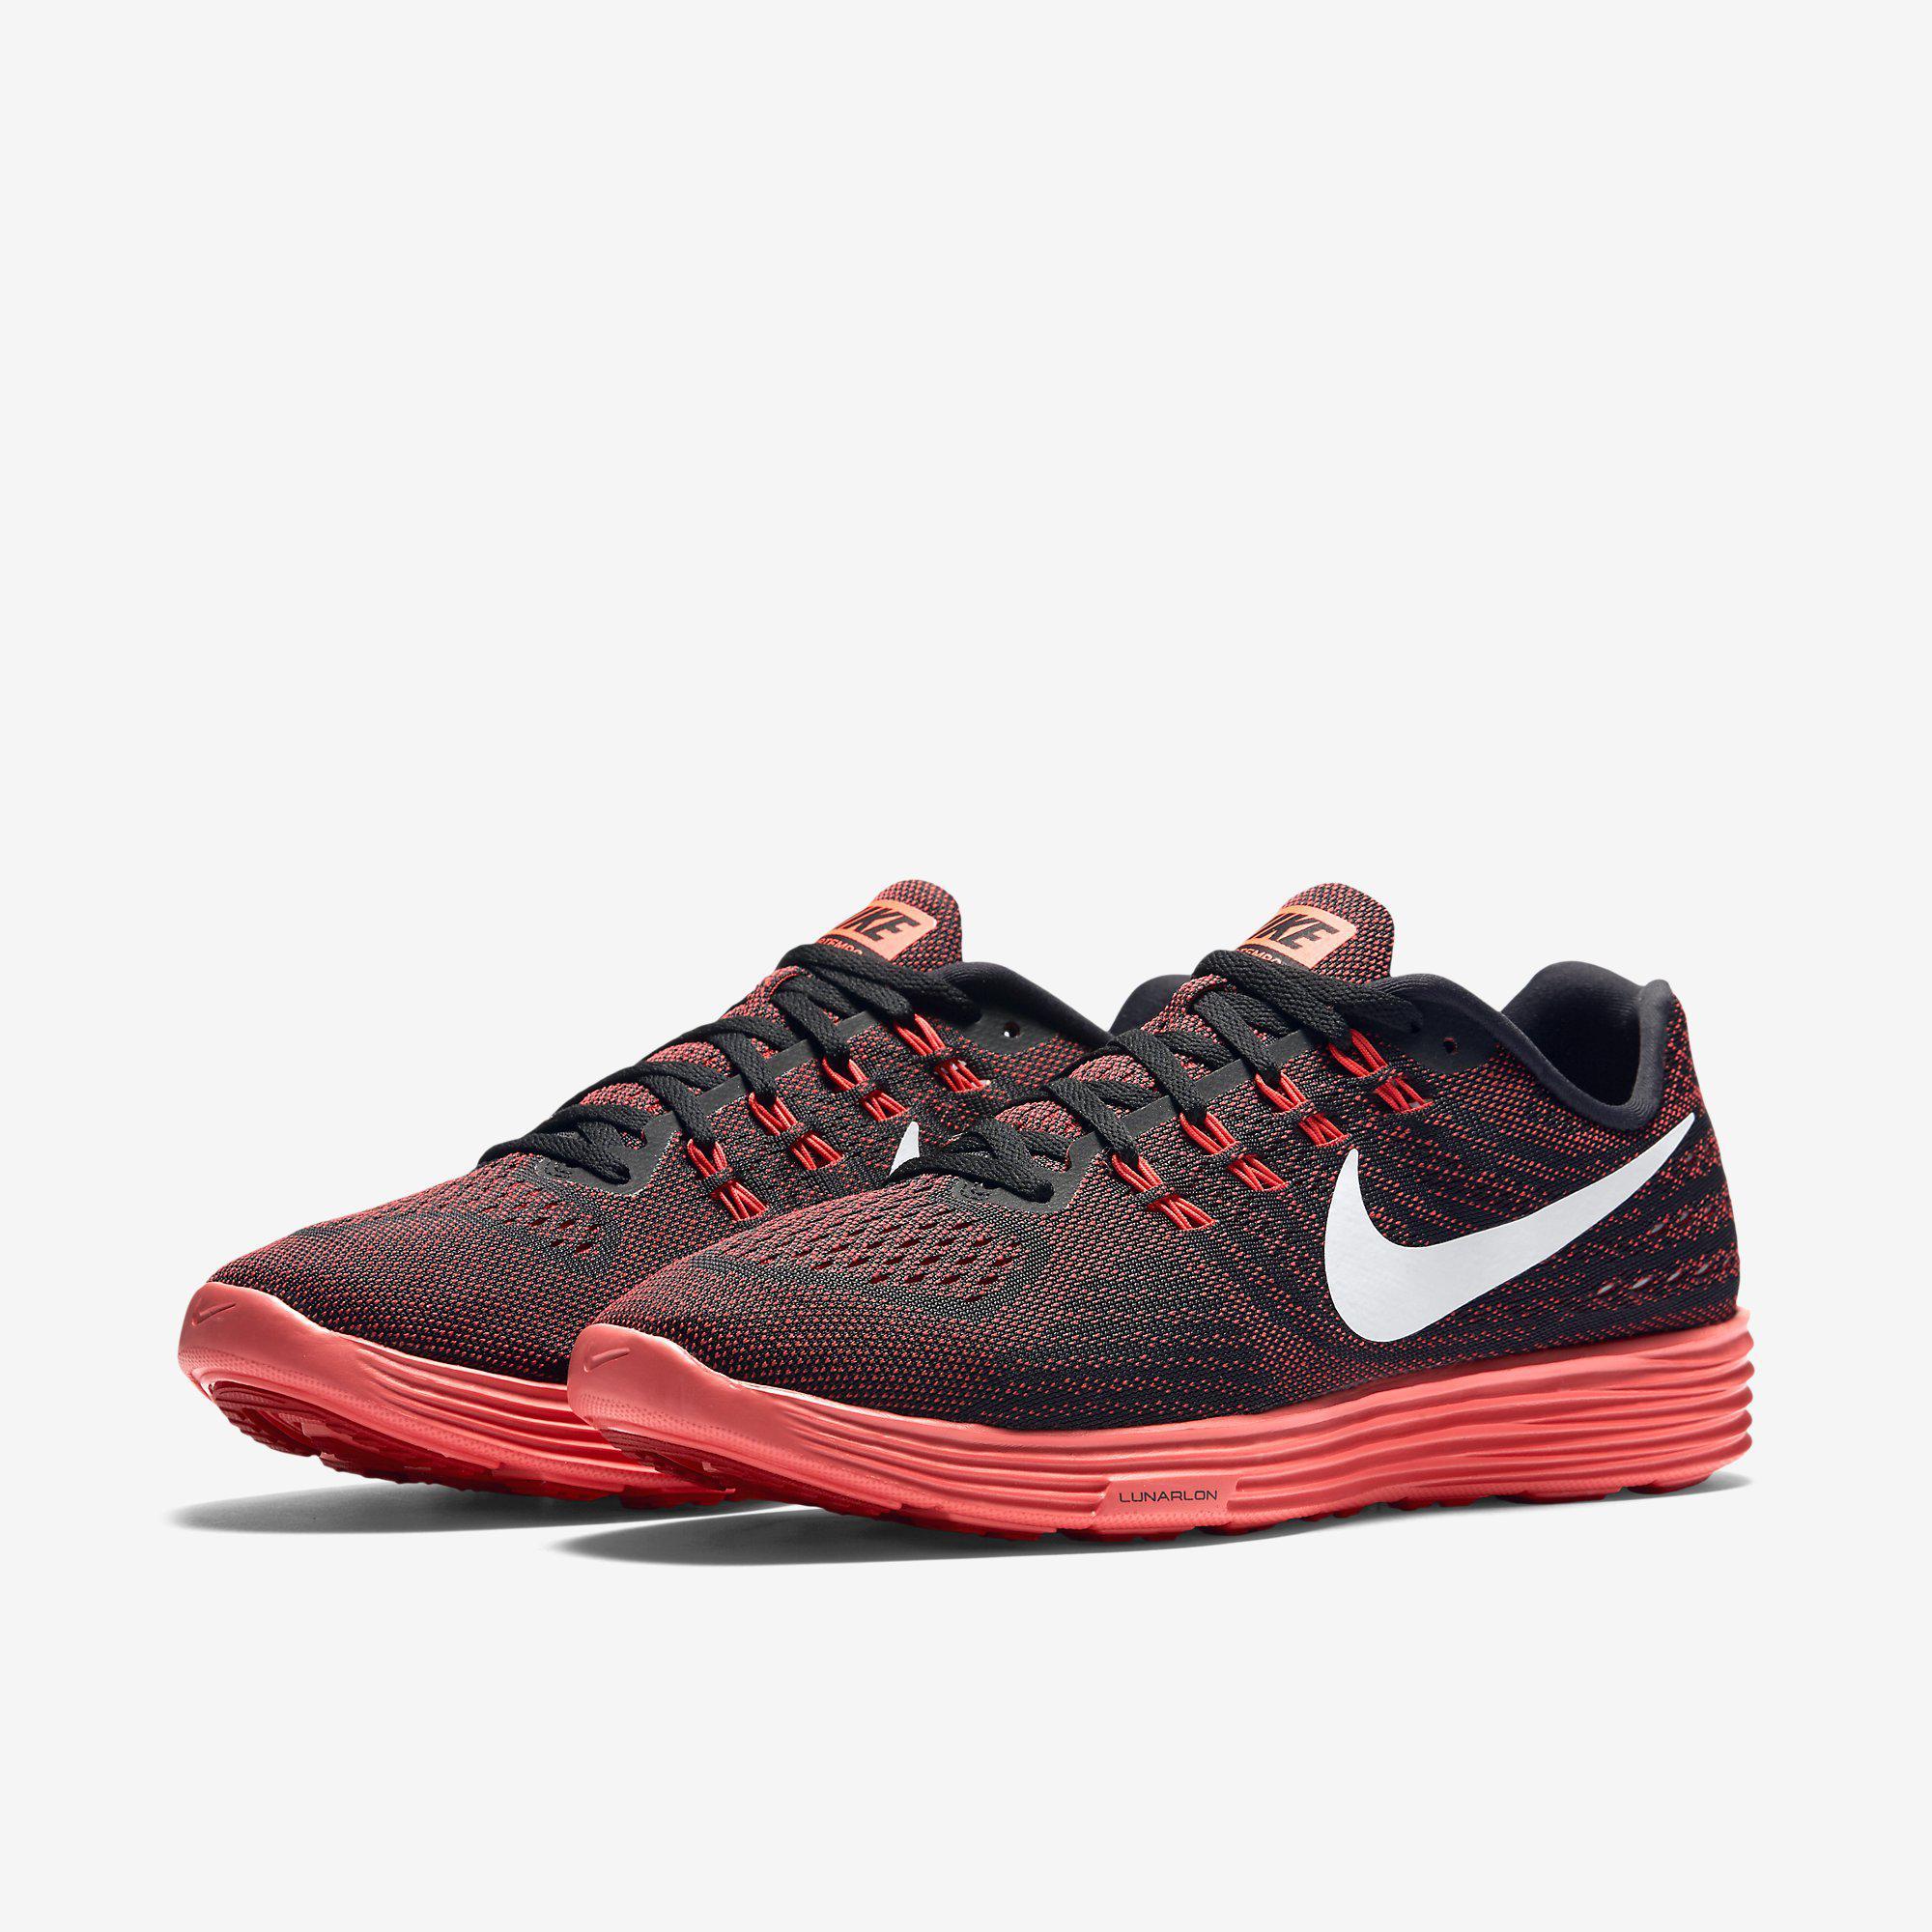 quality design eade4 893d3 Nike Mens LunarTempo 2 Running Shoes - Red Black